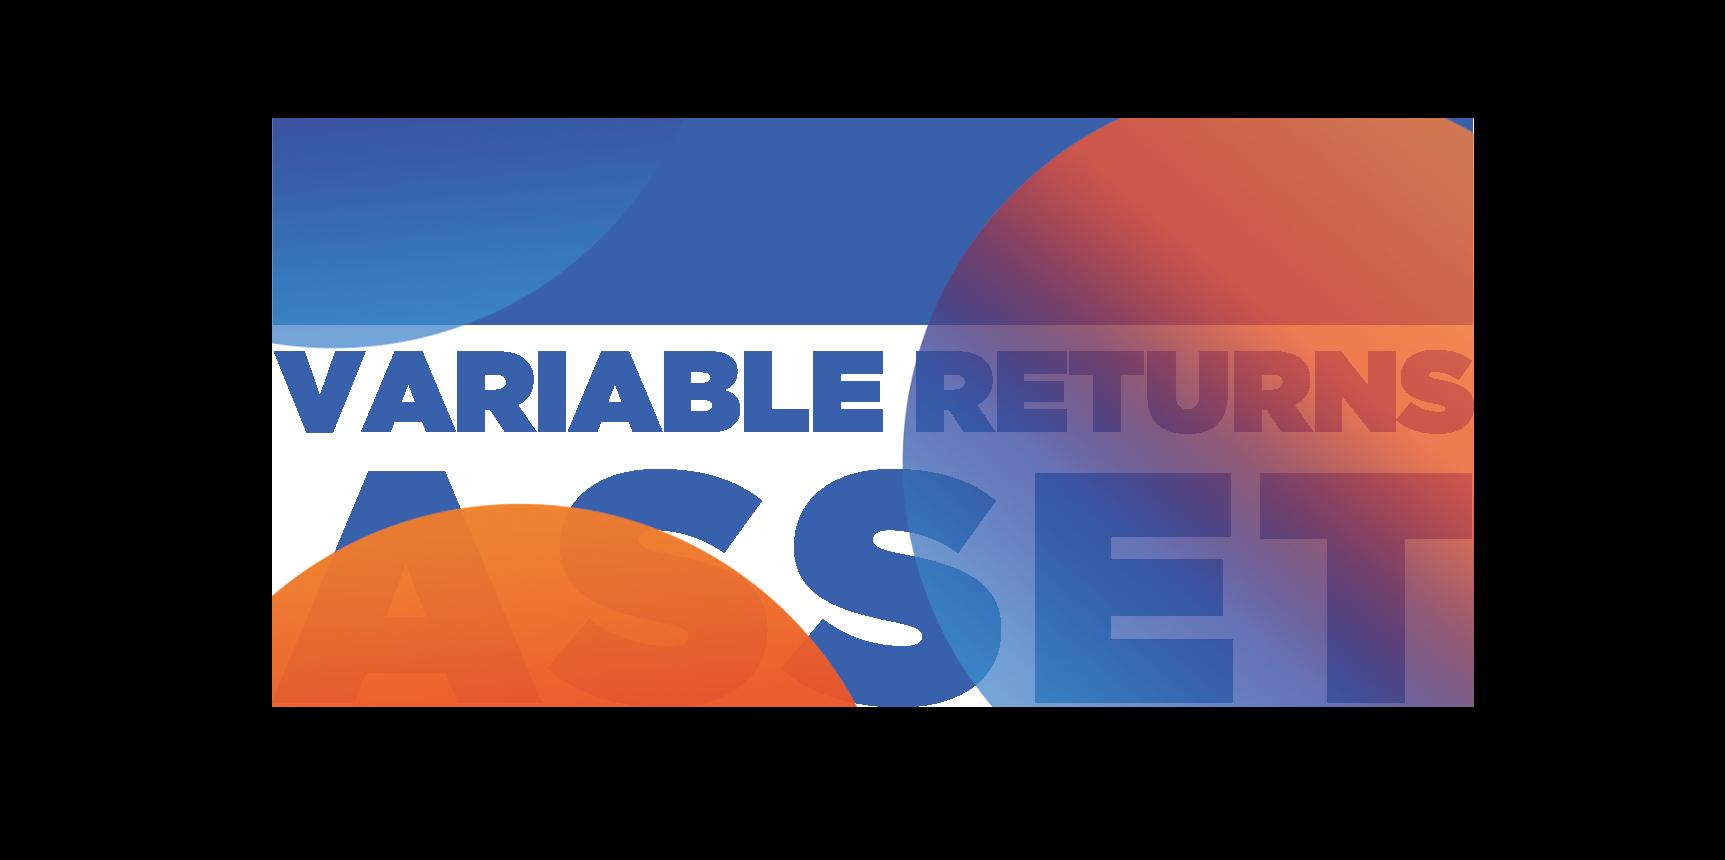 Dollar Variable Returns Asset